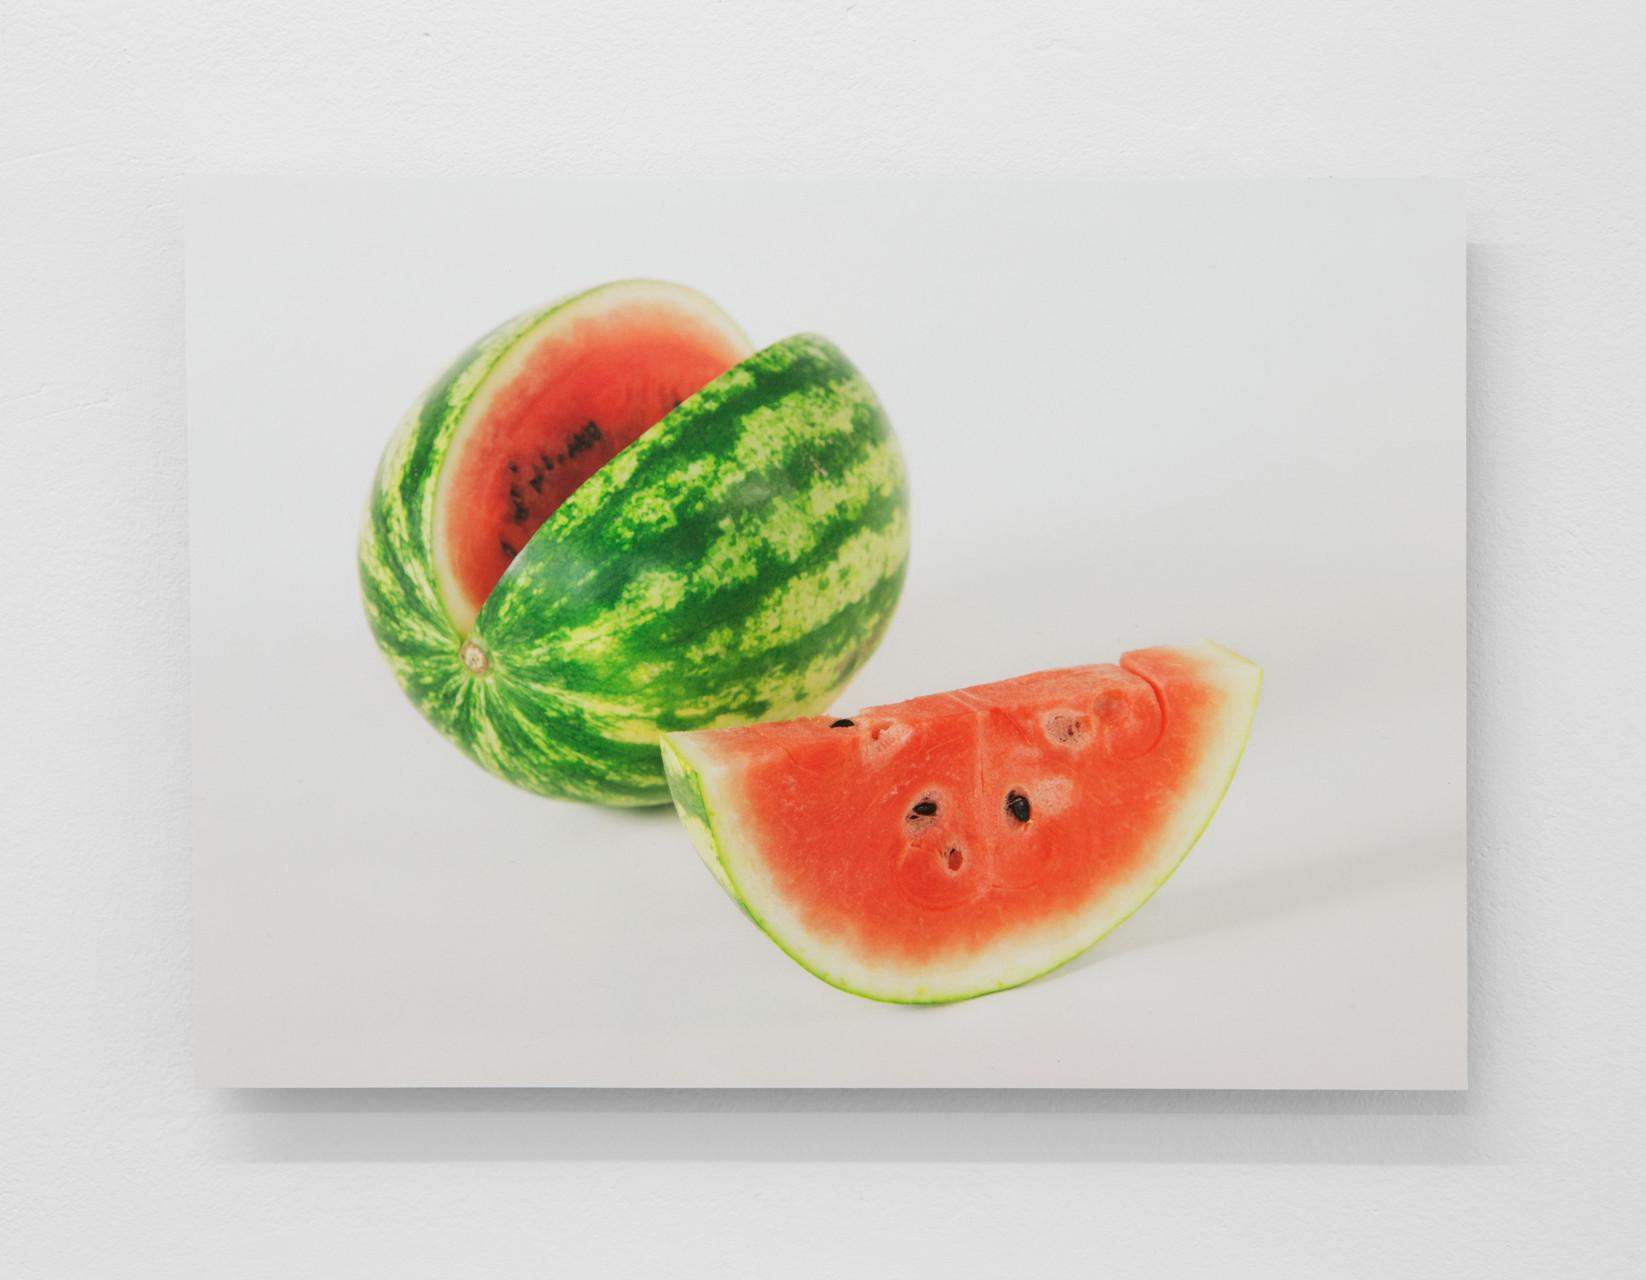 18 Watermelon and slice